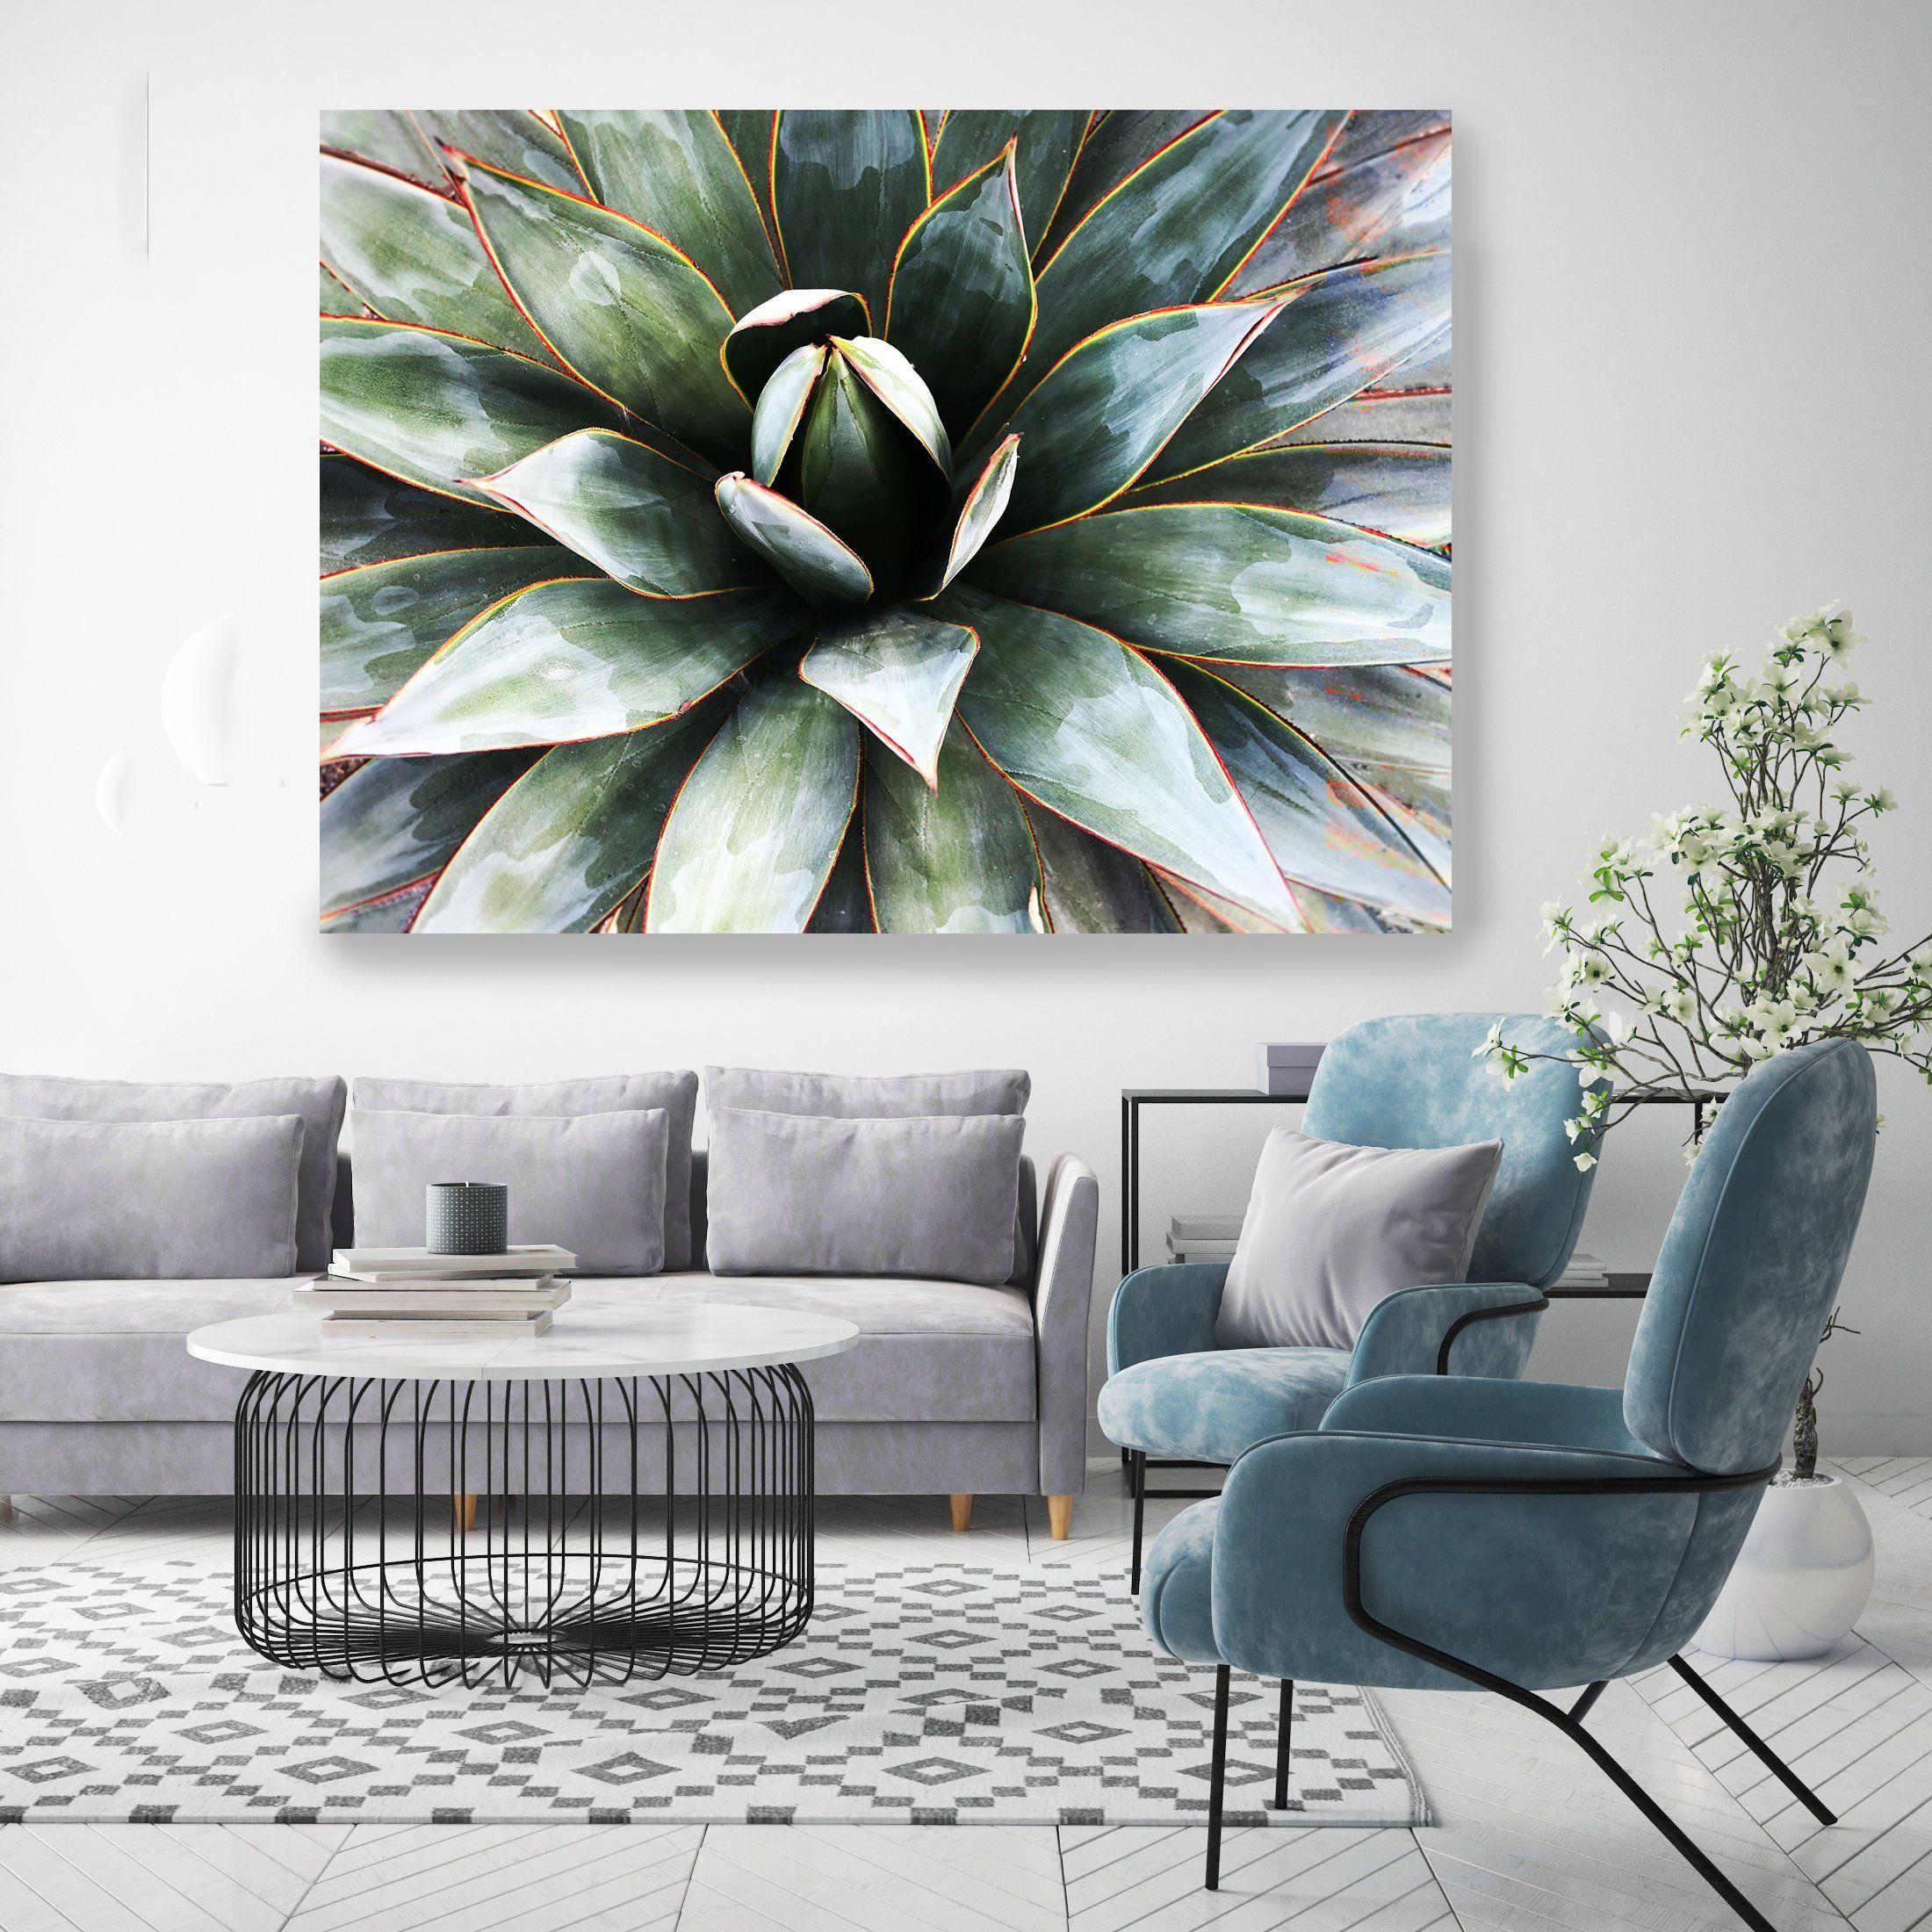 Agave Heart 2 1 Succulent Wall Art Pale Green Canvas Prints Etsy Succulent Wall Art Tropical Wall Decor Succulent Wall